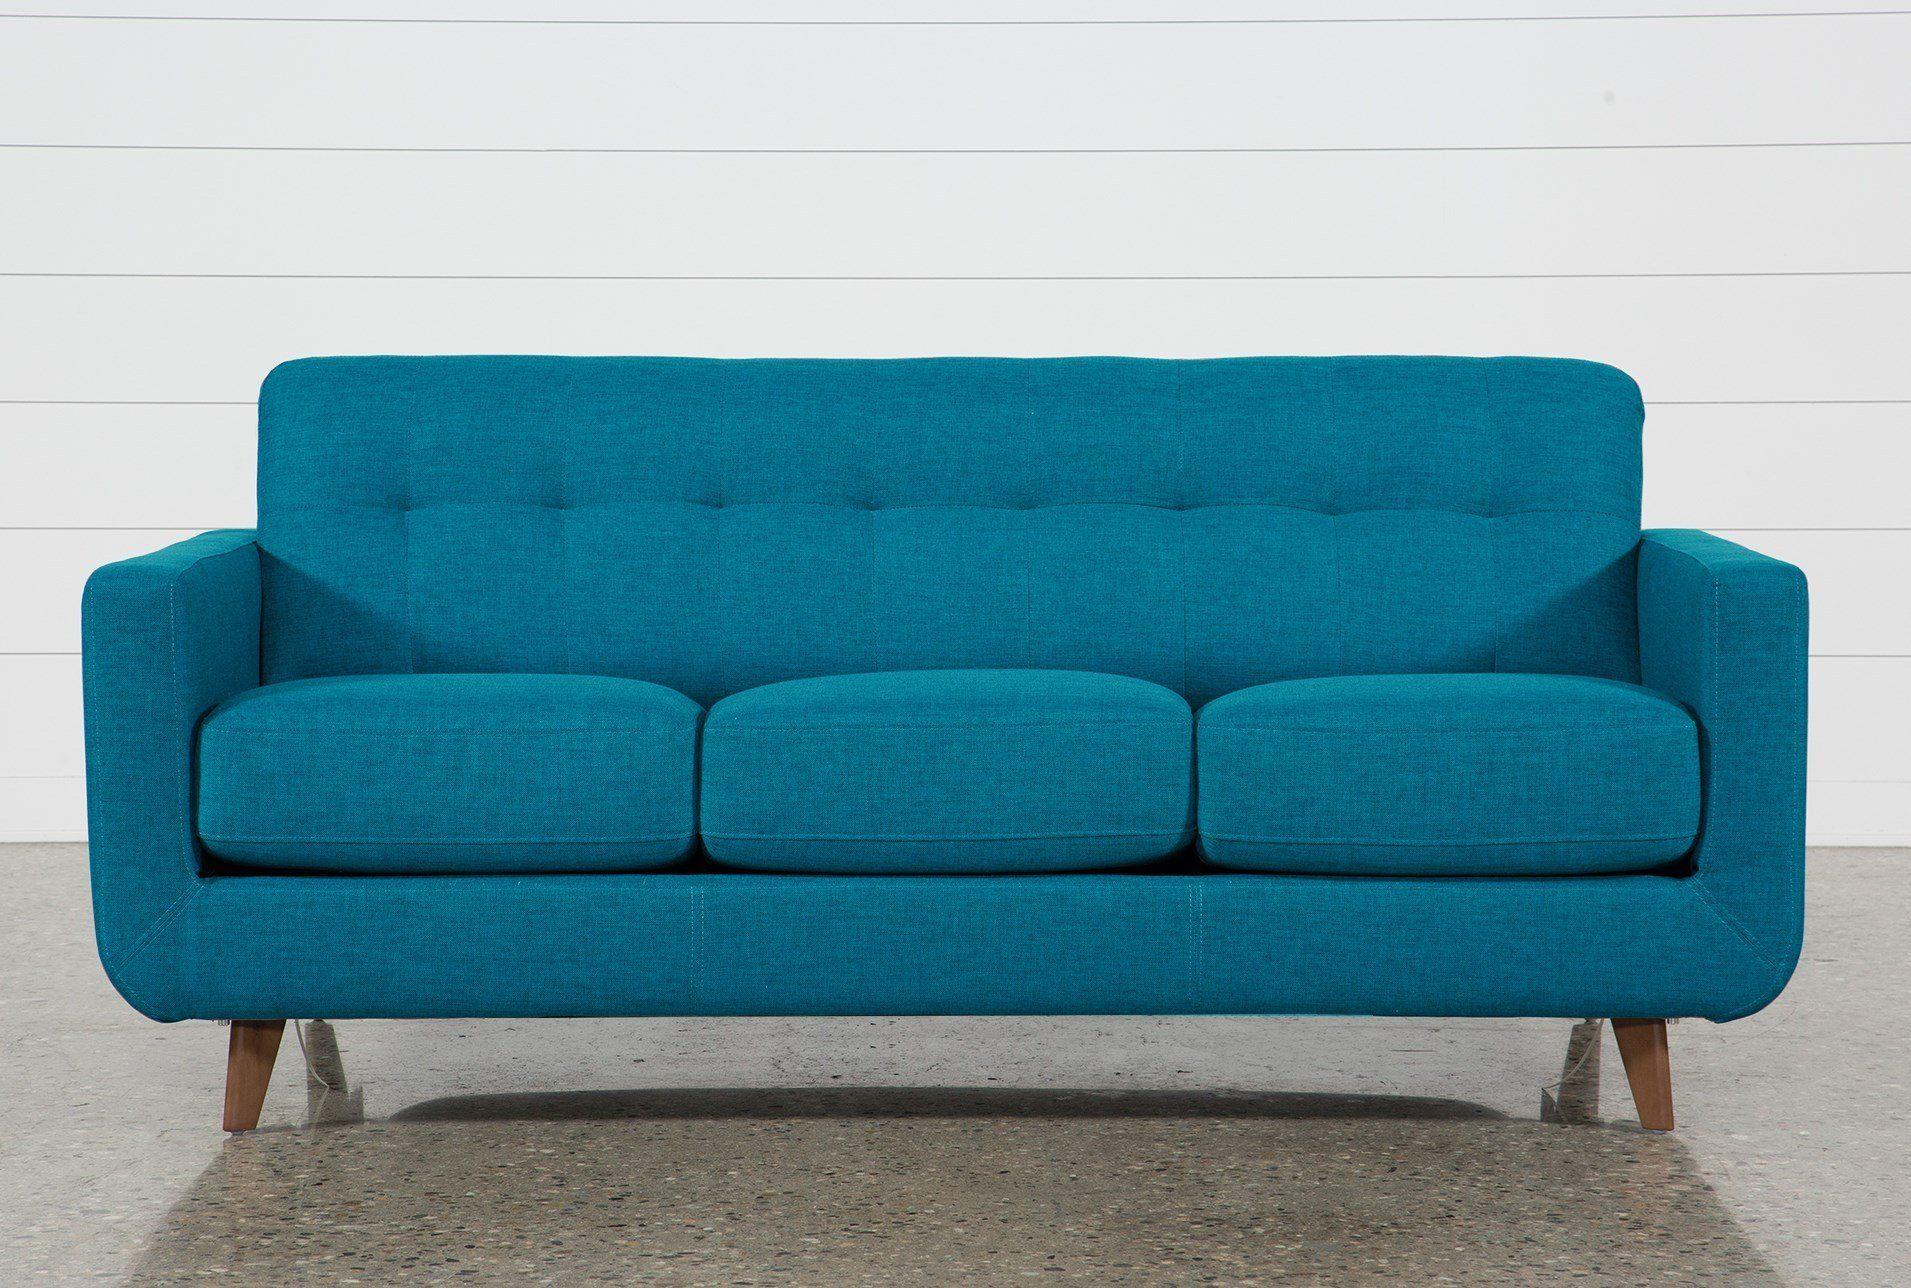 Allie Jade Queen Sleeper Sofa bed design, Bed sets for